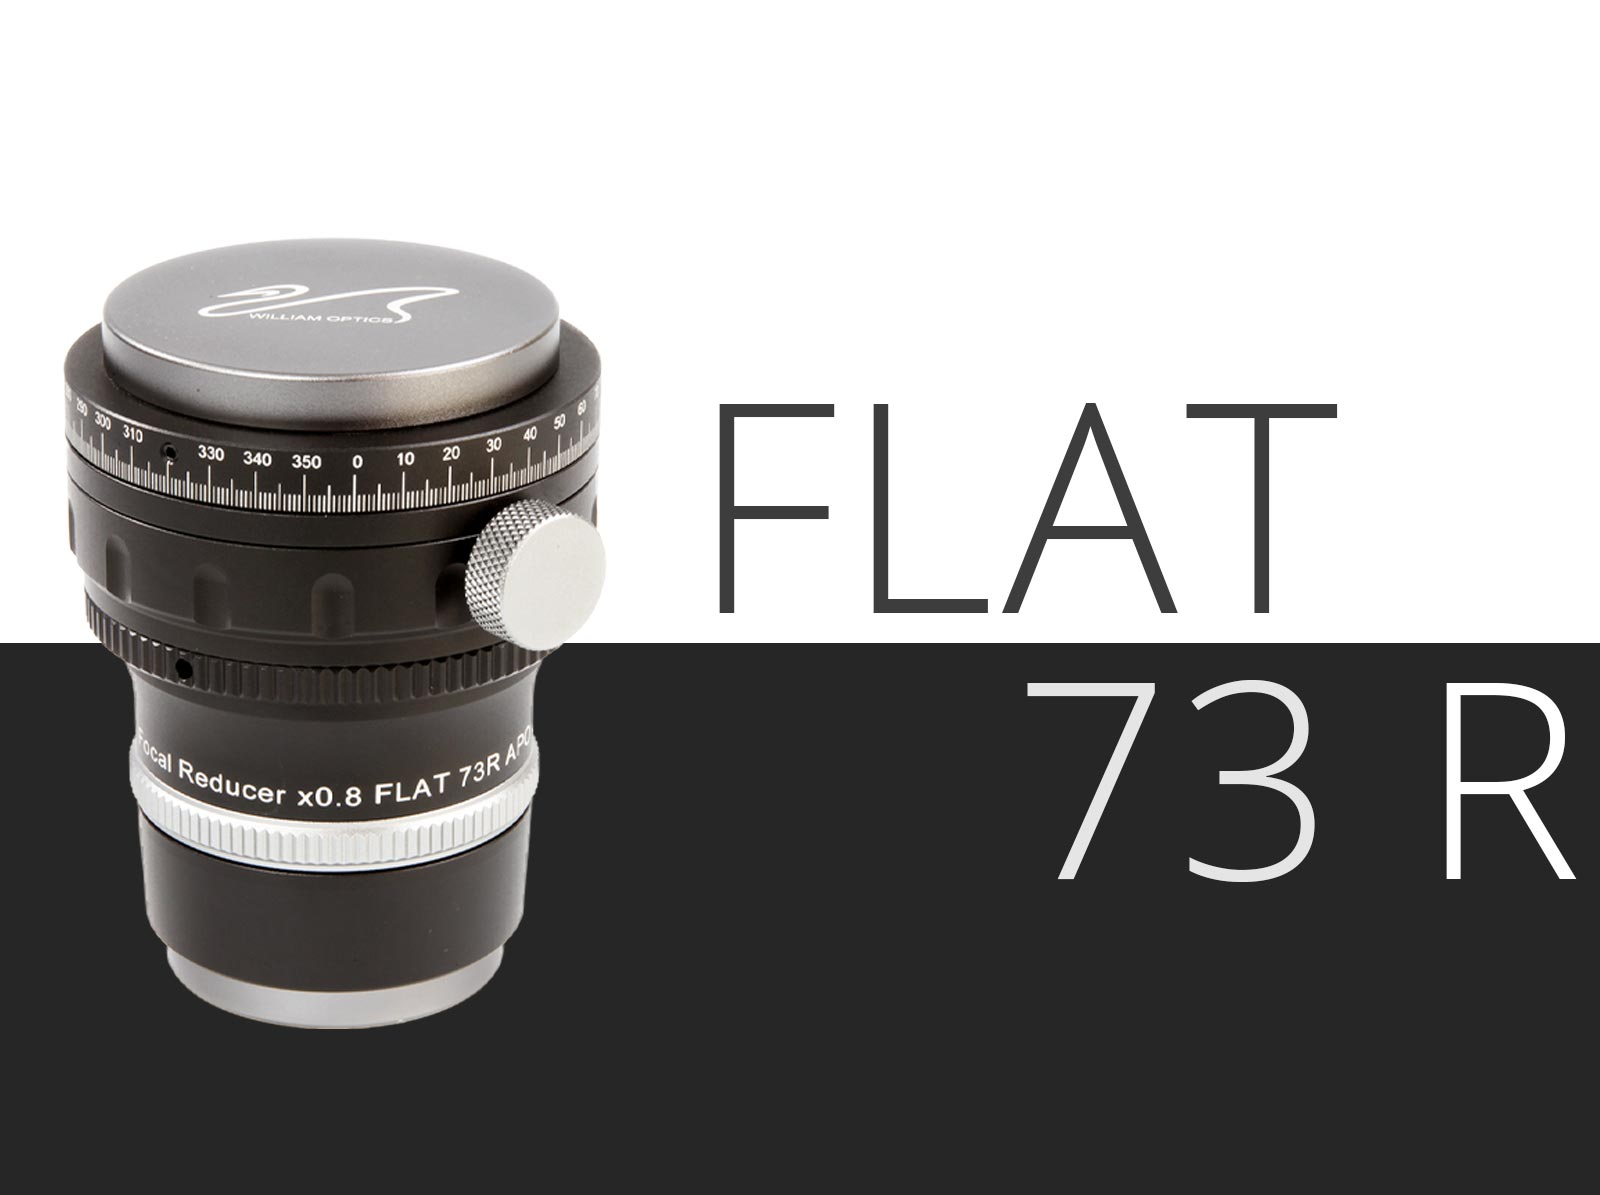 flat-73-r-1.jpg